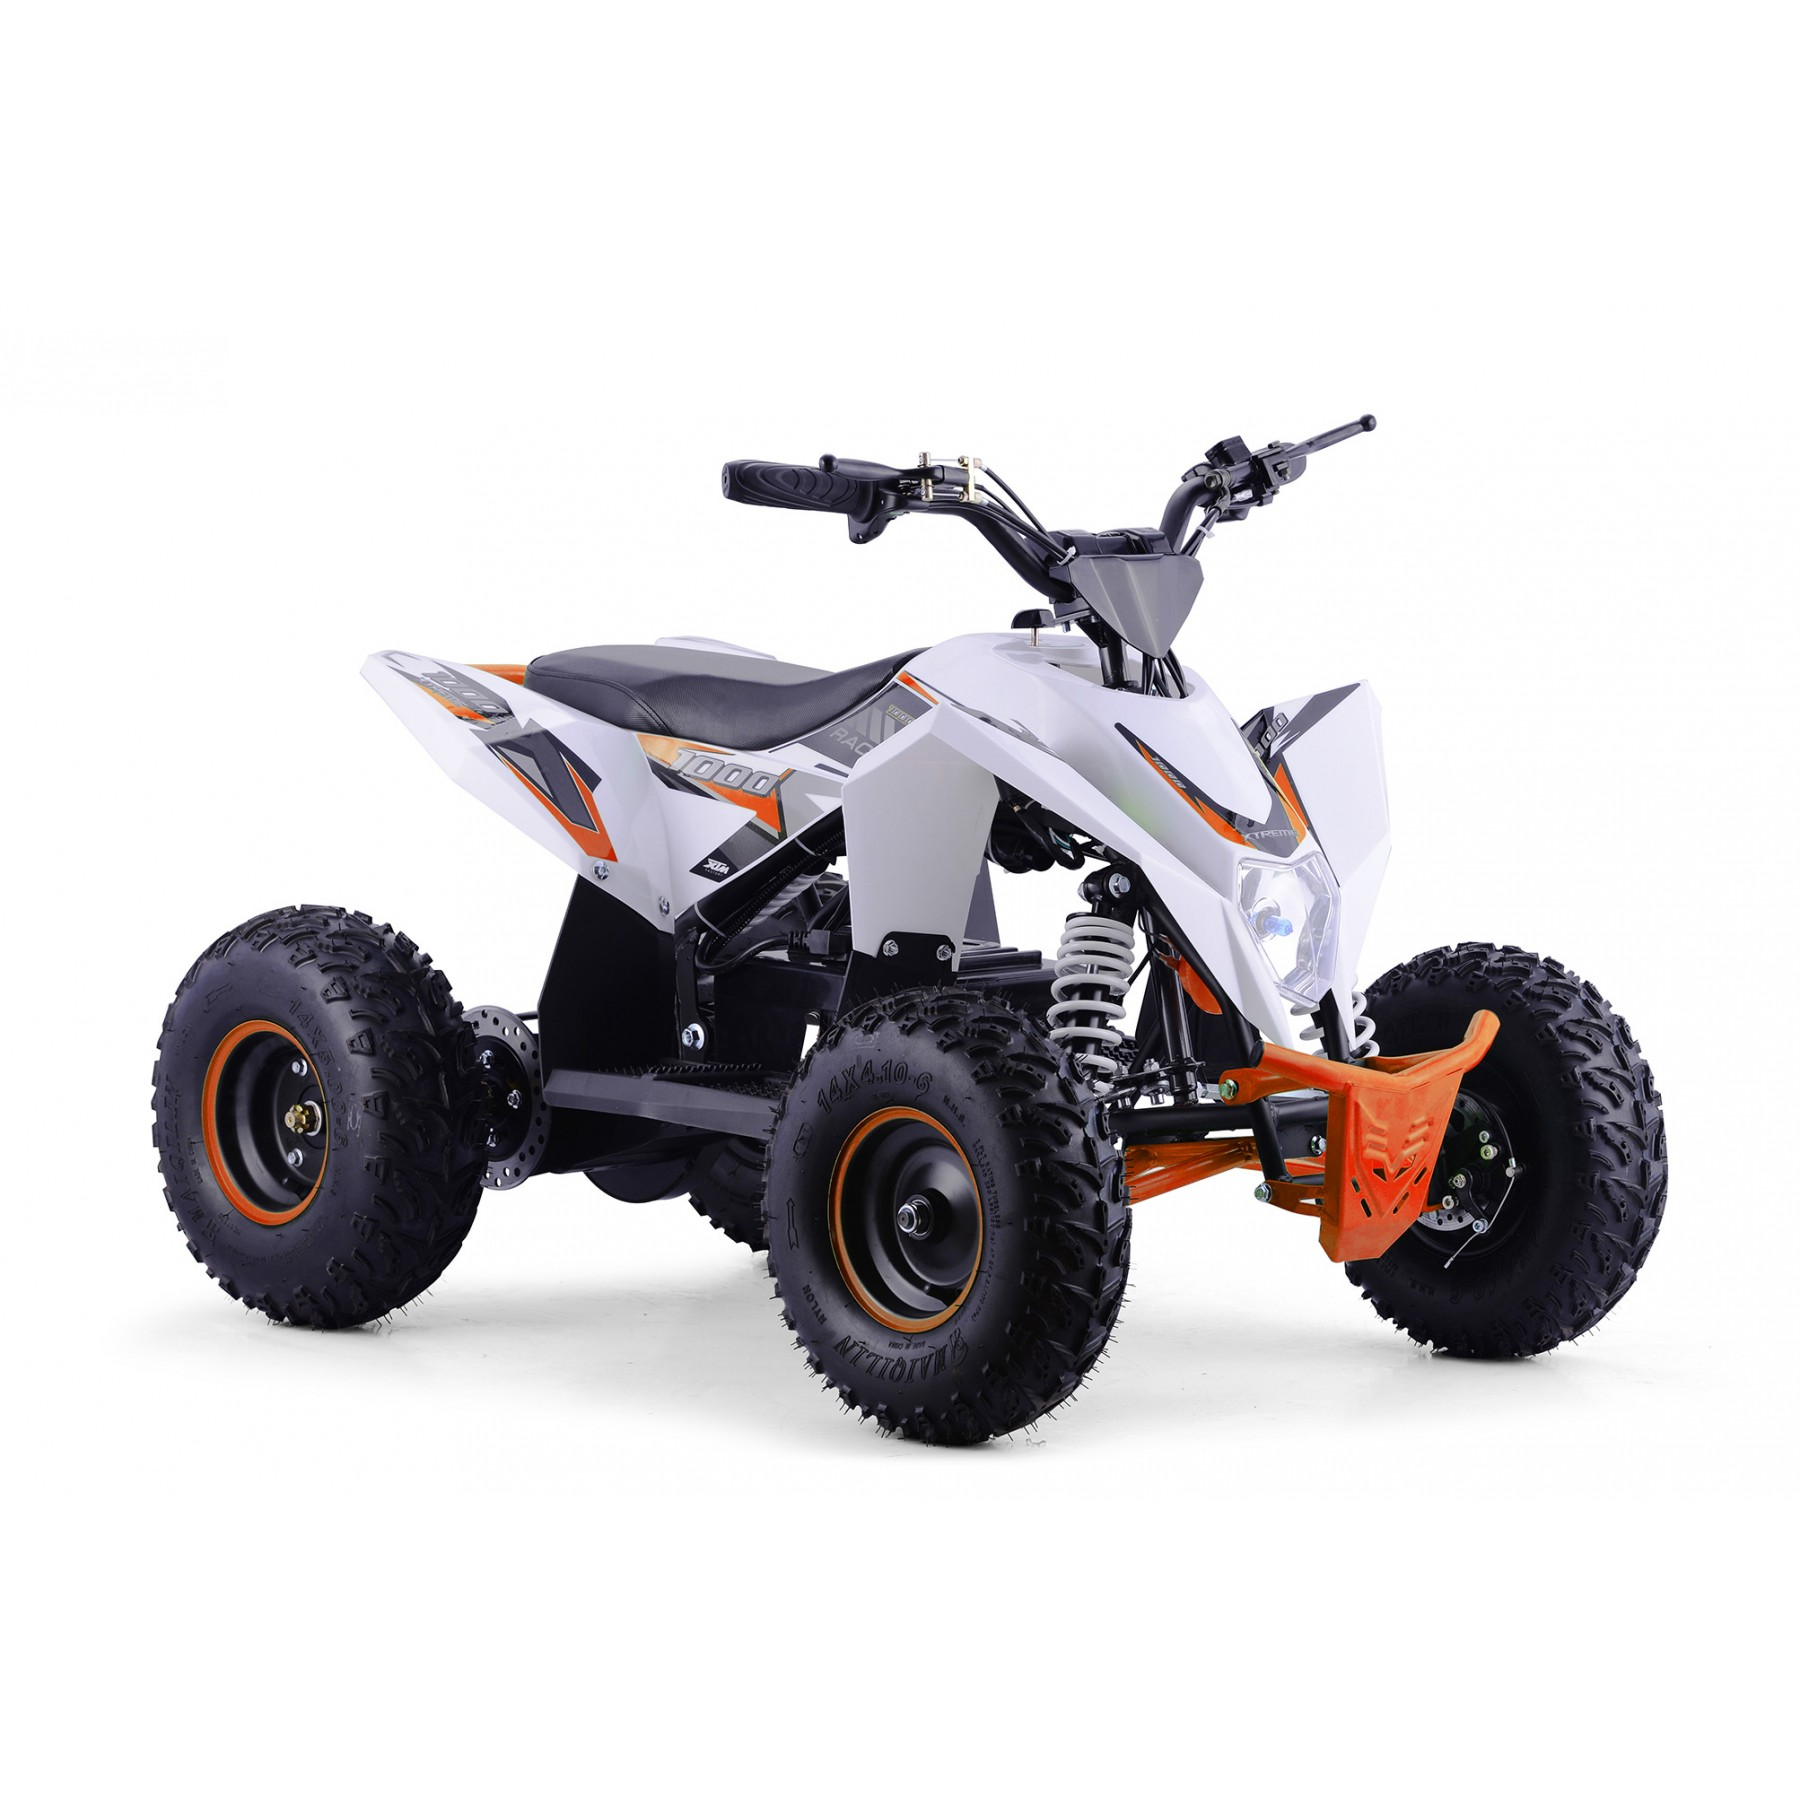 XTM RACING 1000w QUAD BIKE WHITE ORANGE